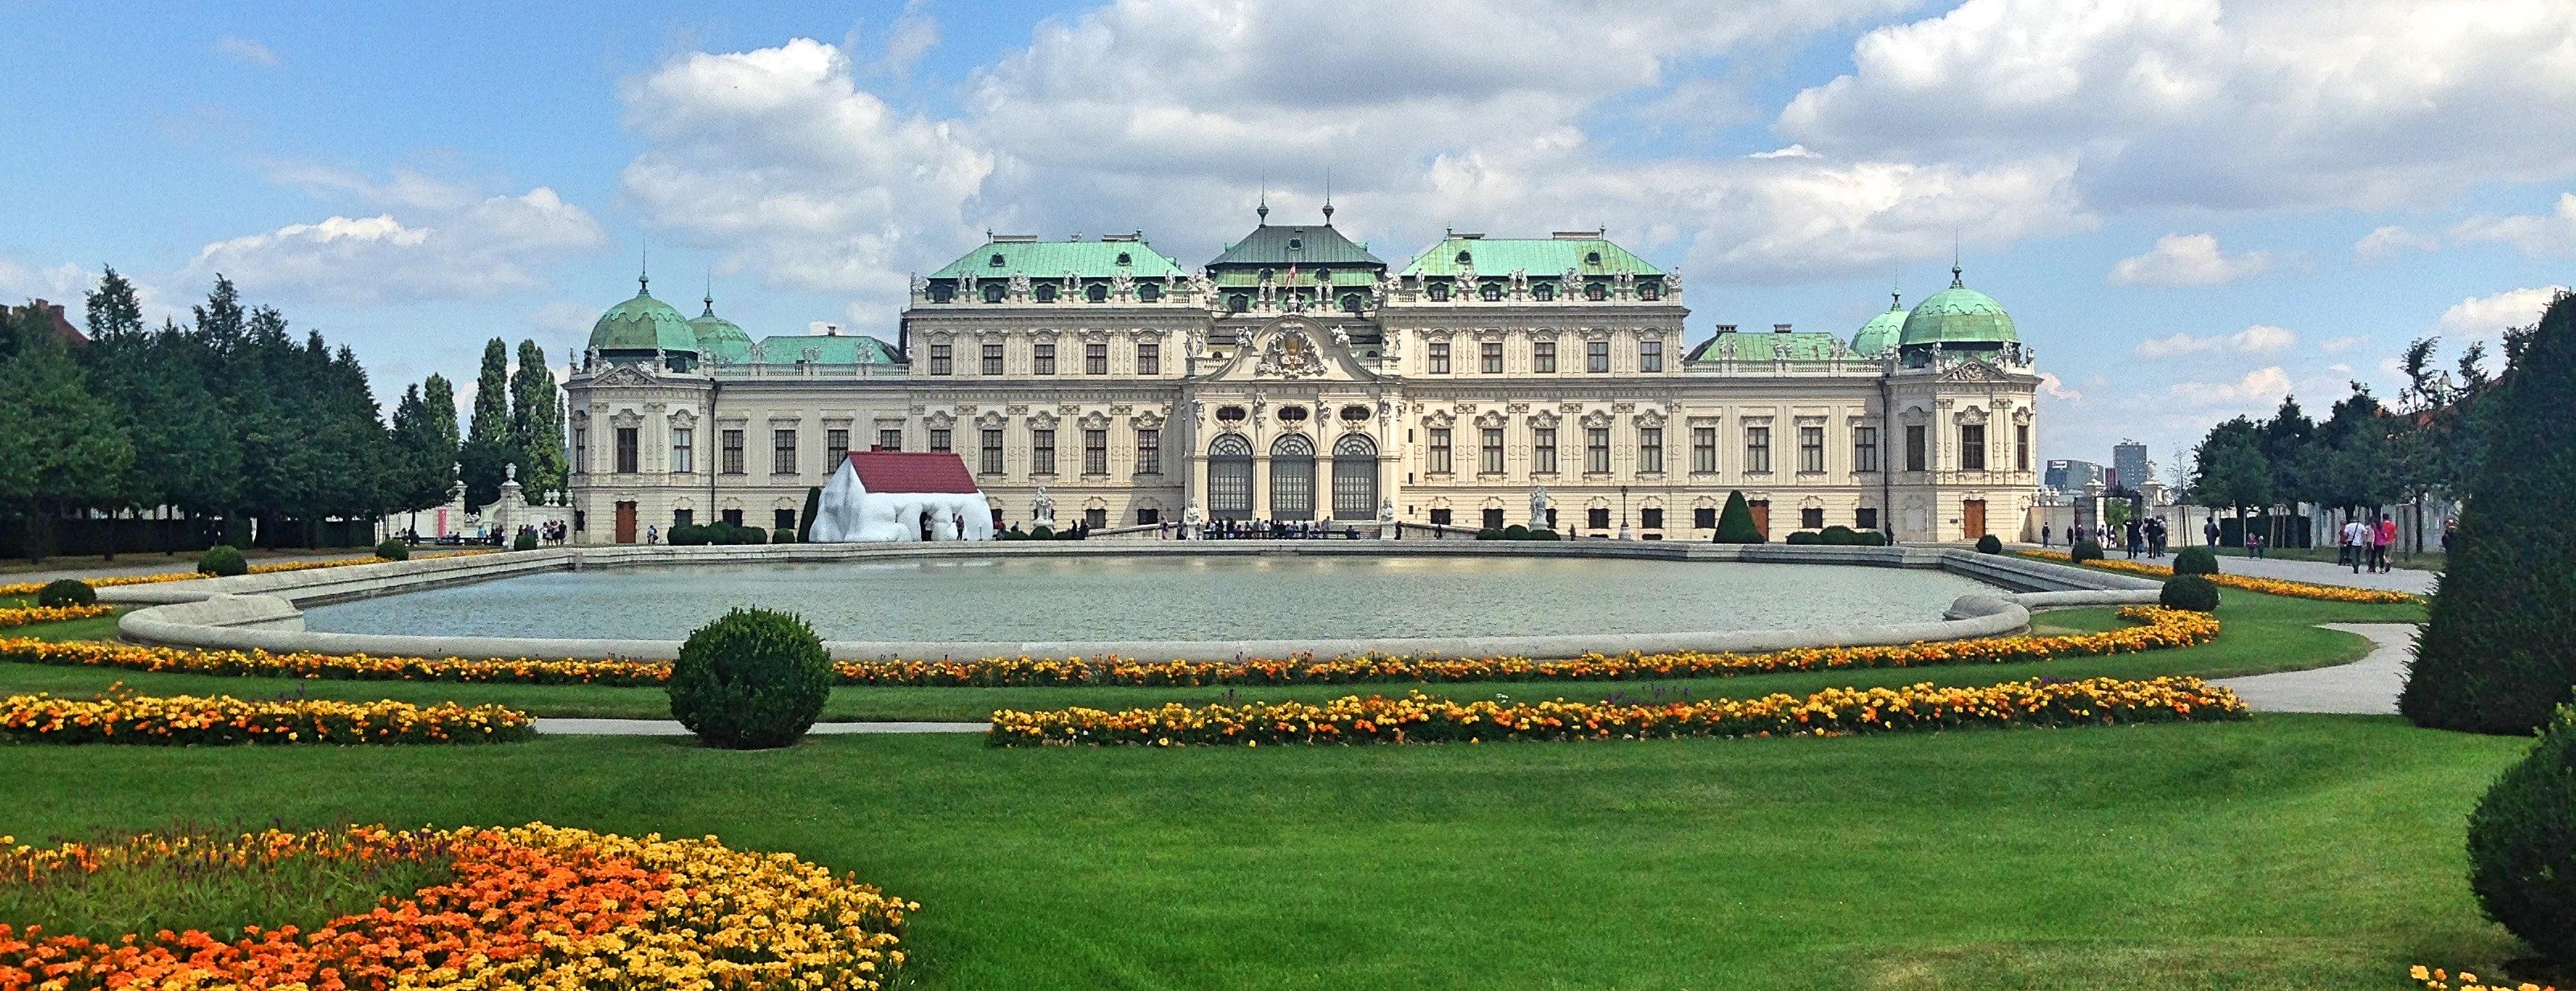 Belvedere_Palace